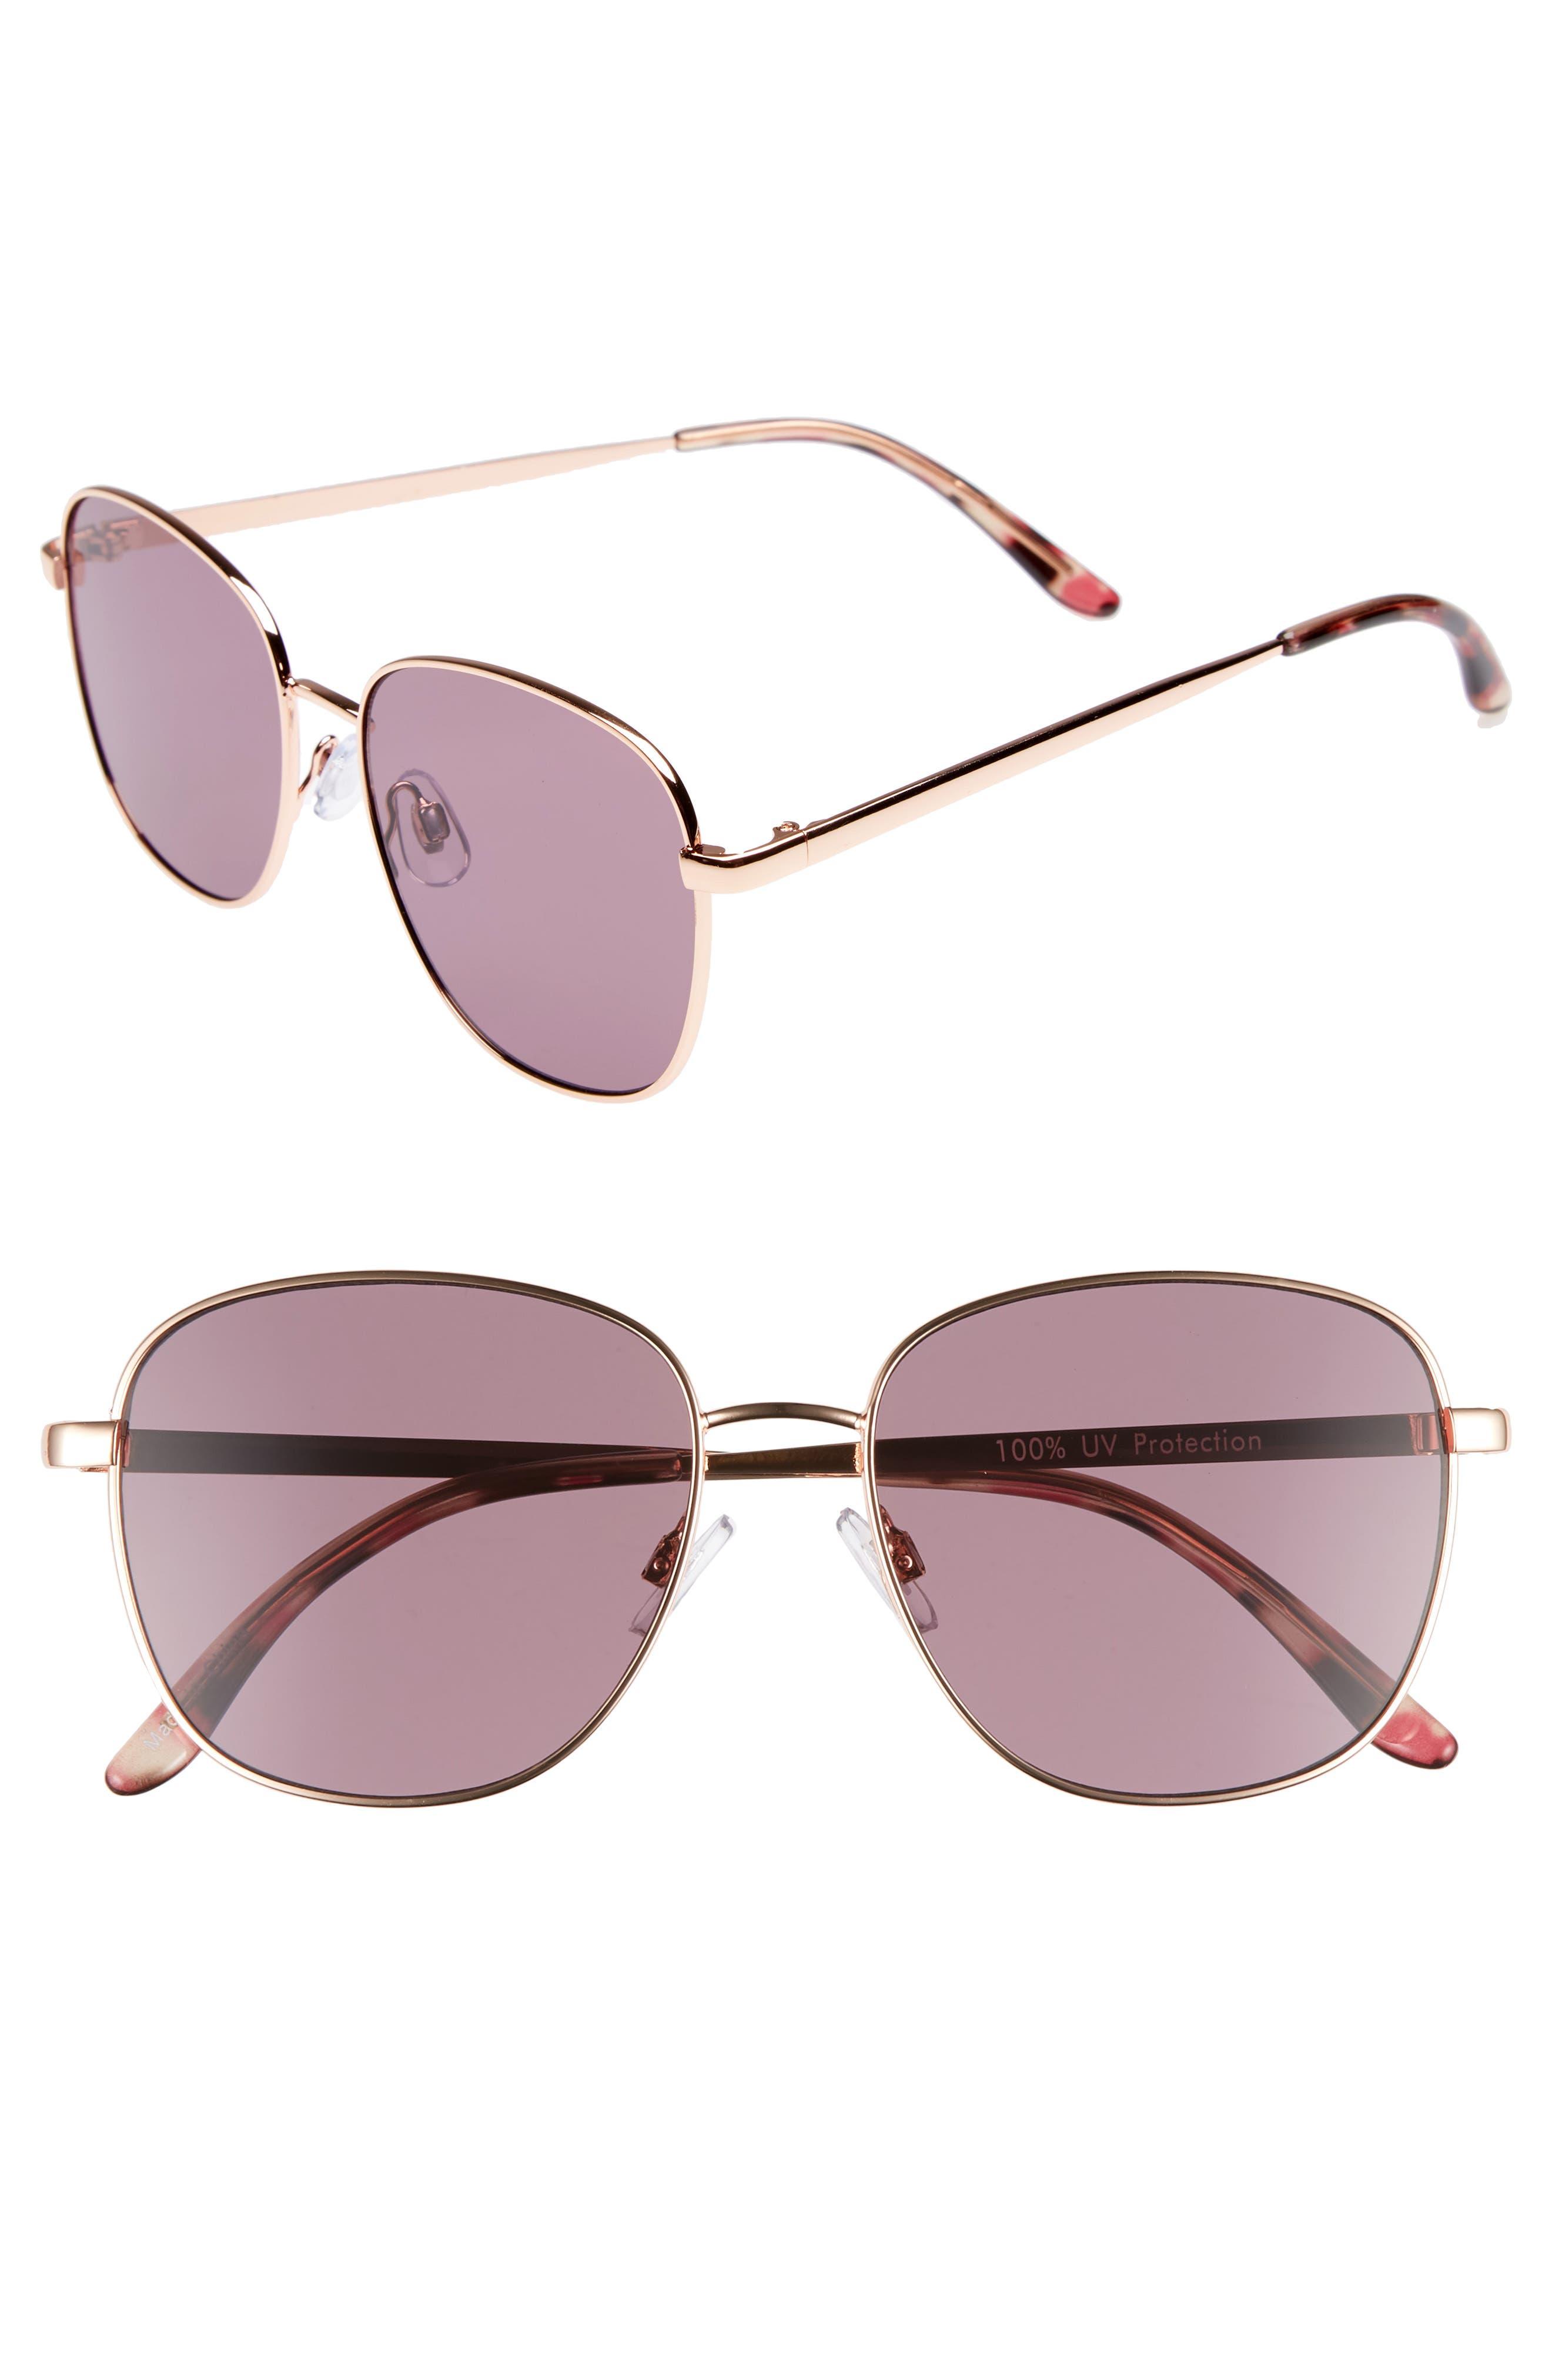 53mm Square Sunglasses,                         Main,                         color, ROSE GOLD/ PURPLE